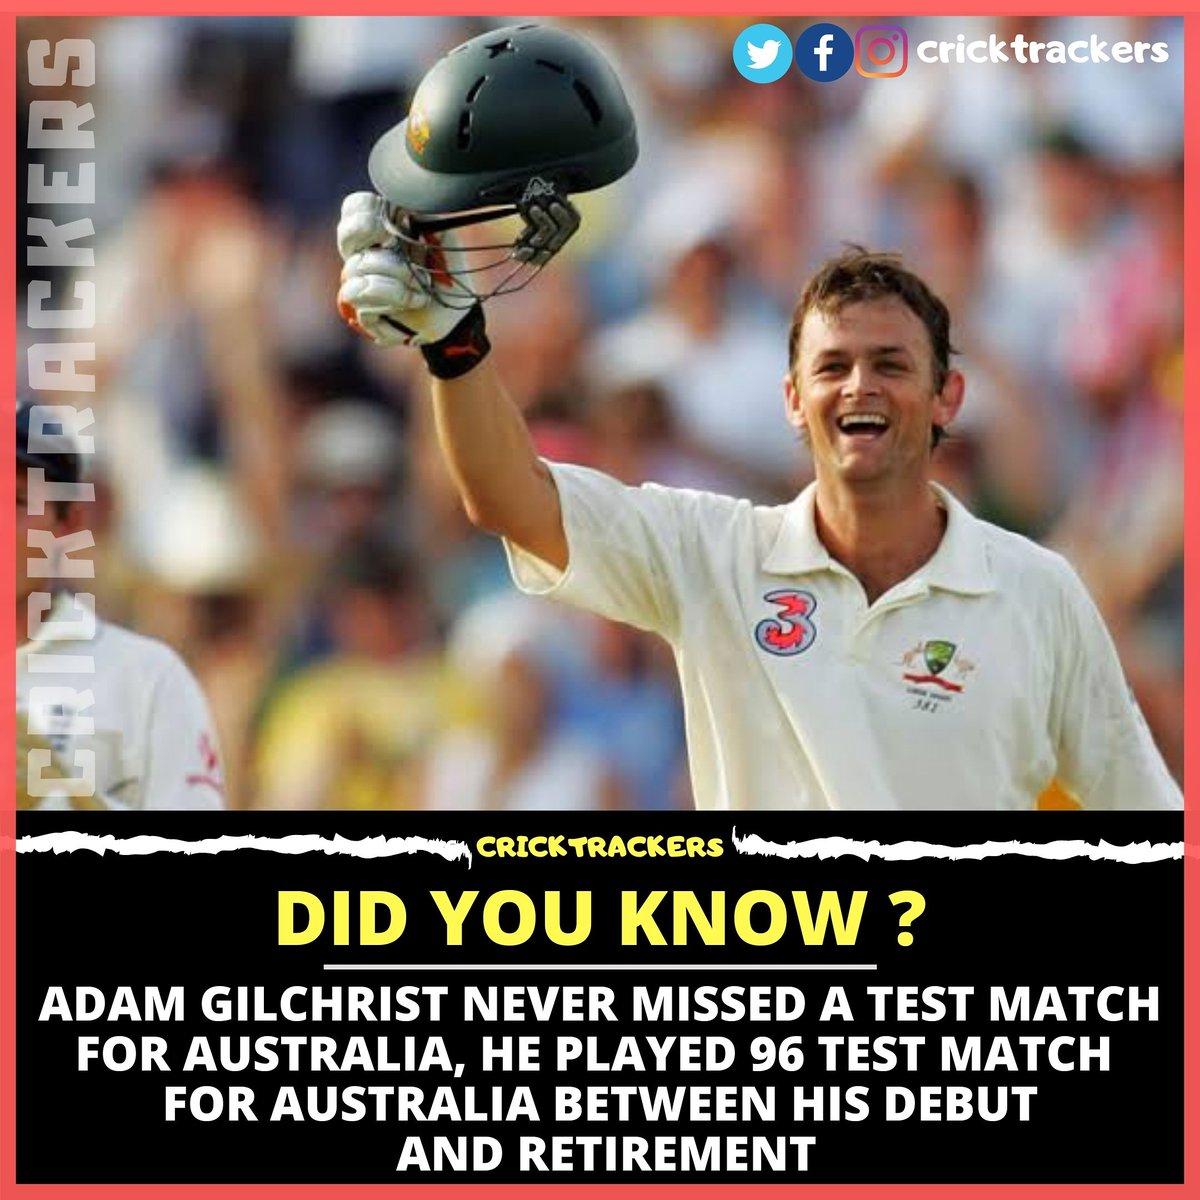 #cricket#PatCummins#JaspritBumrah#InternationalCricket#indiancricket#IndianCricketer#indiancricketteam#Australiacricket#Australia#australiancricket #indvssa #cricketafrica @gilly381#adamgilchrist #cricketaustralia#virat#rohit#rohitians#iplauction#captaincool